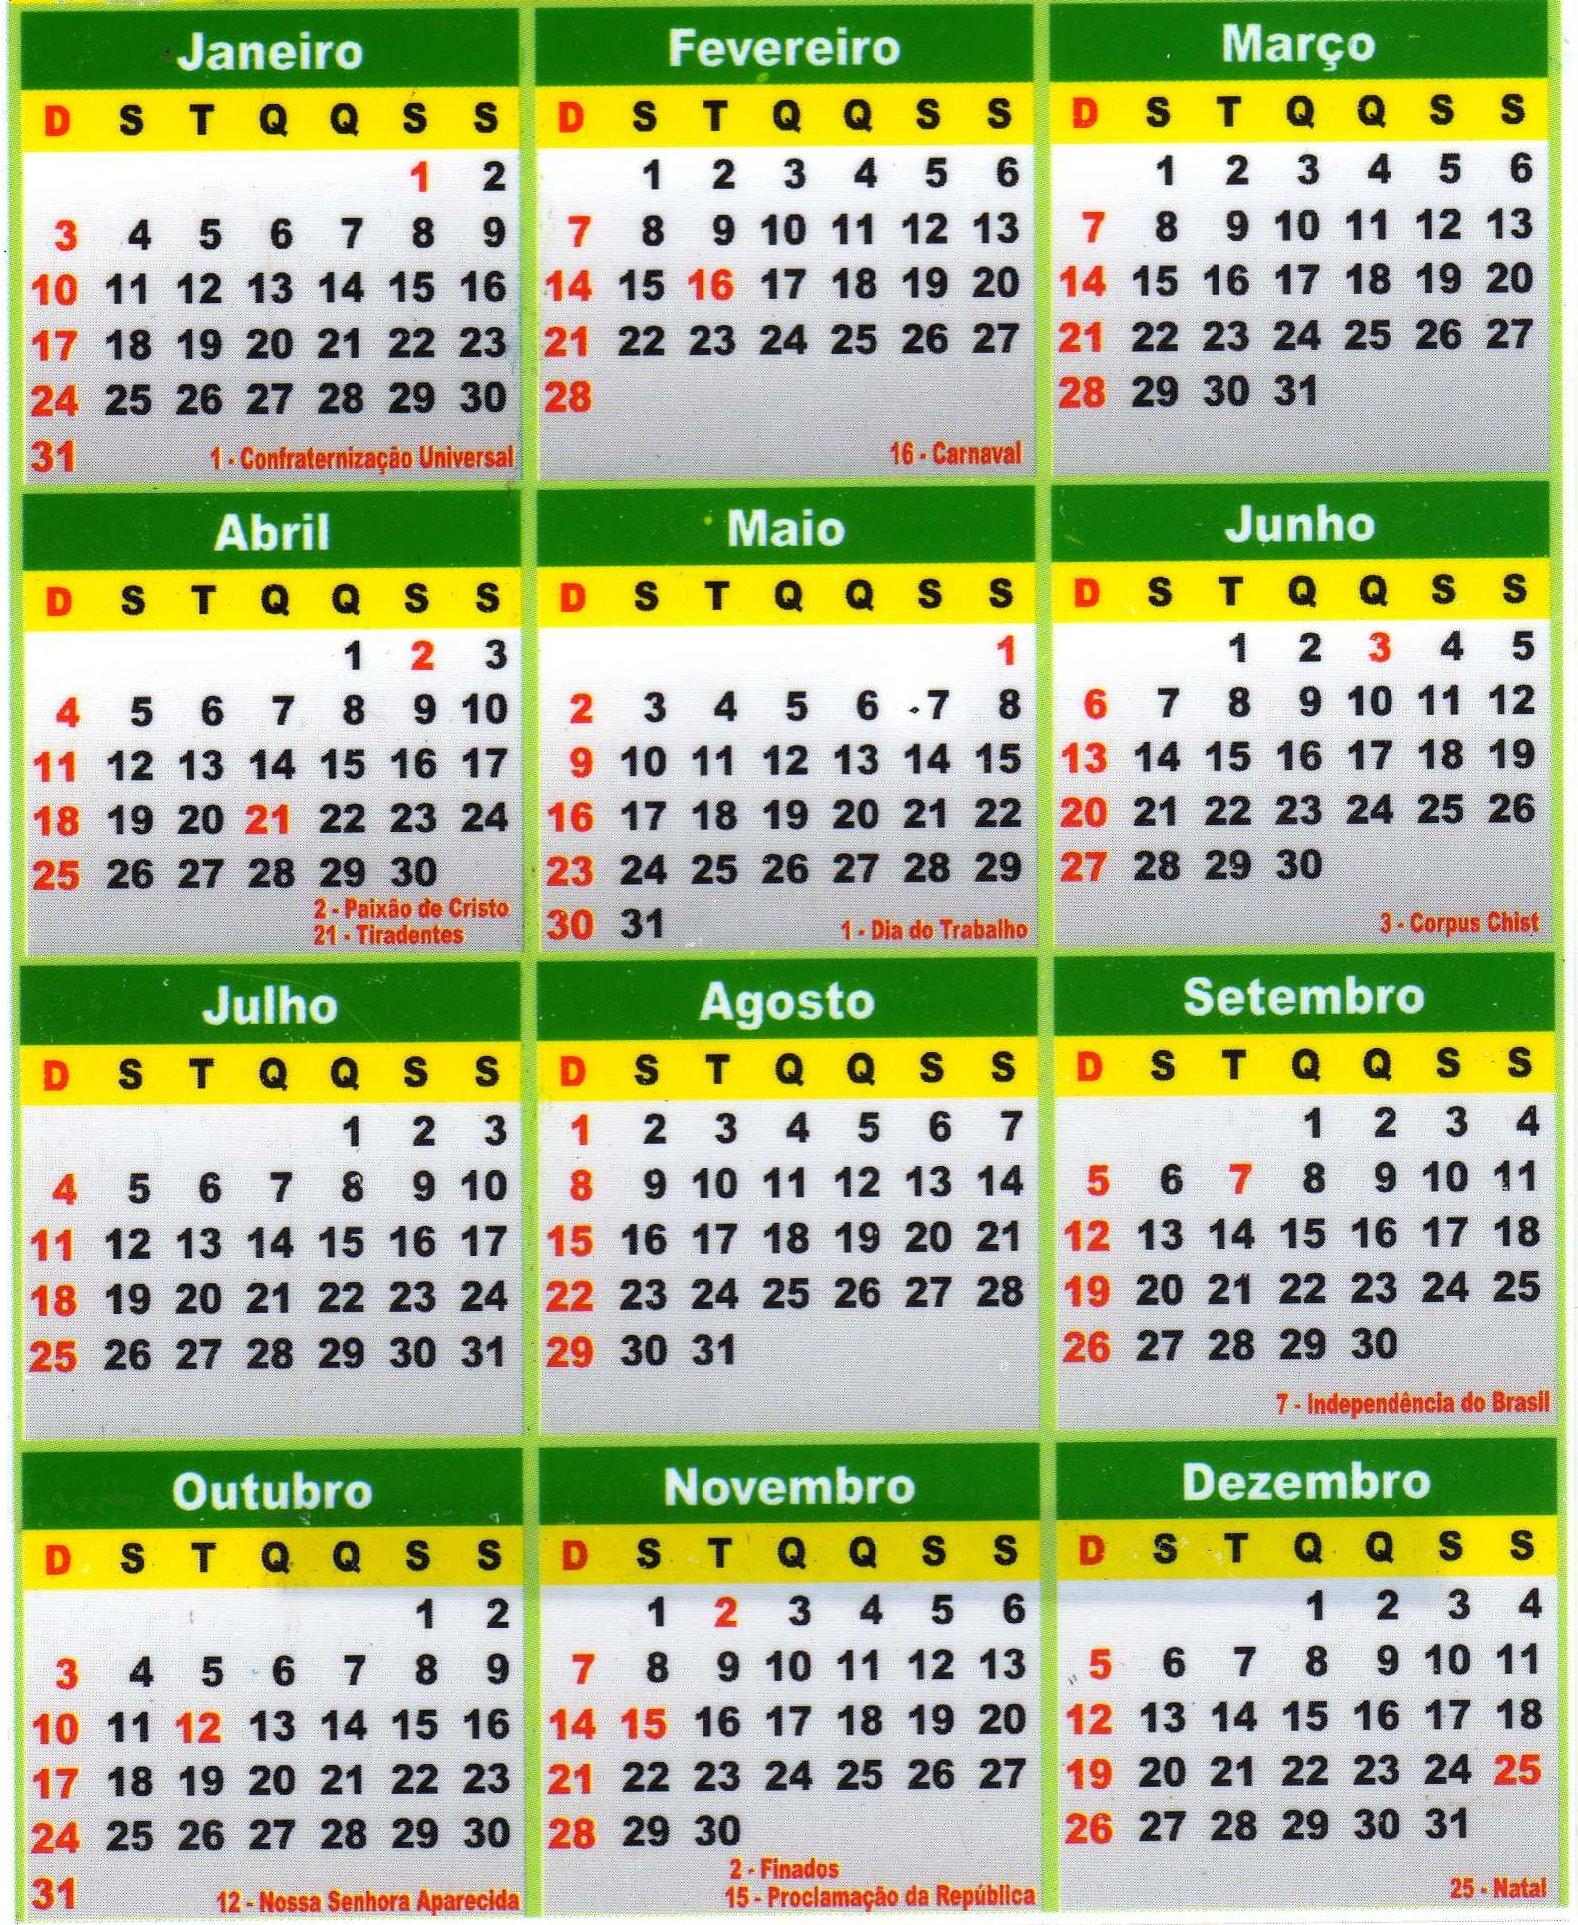 Calendario Lunar 2015 Mexico | New Calendar Template Site